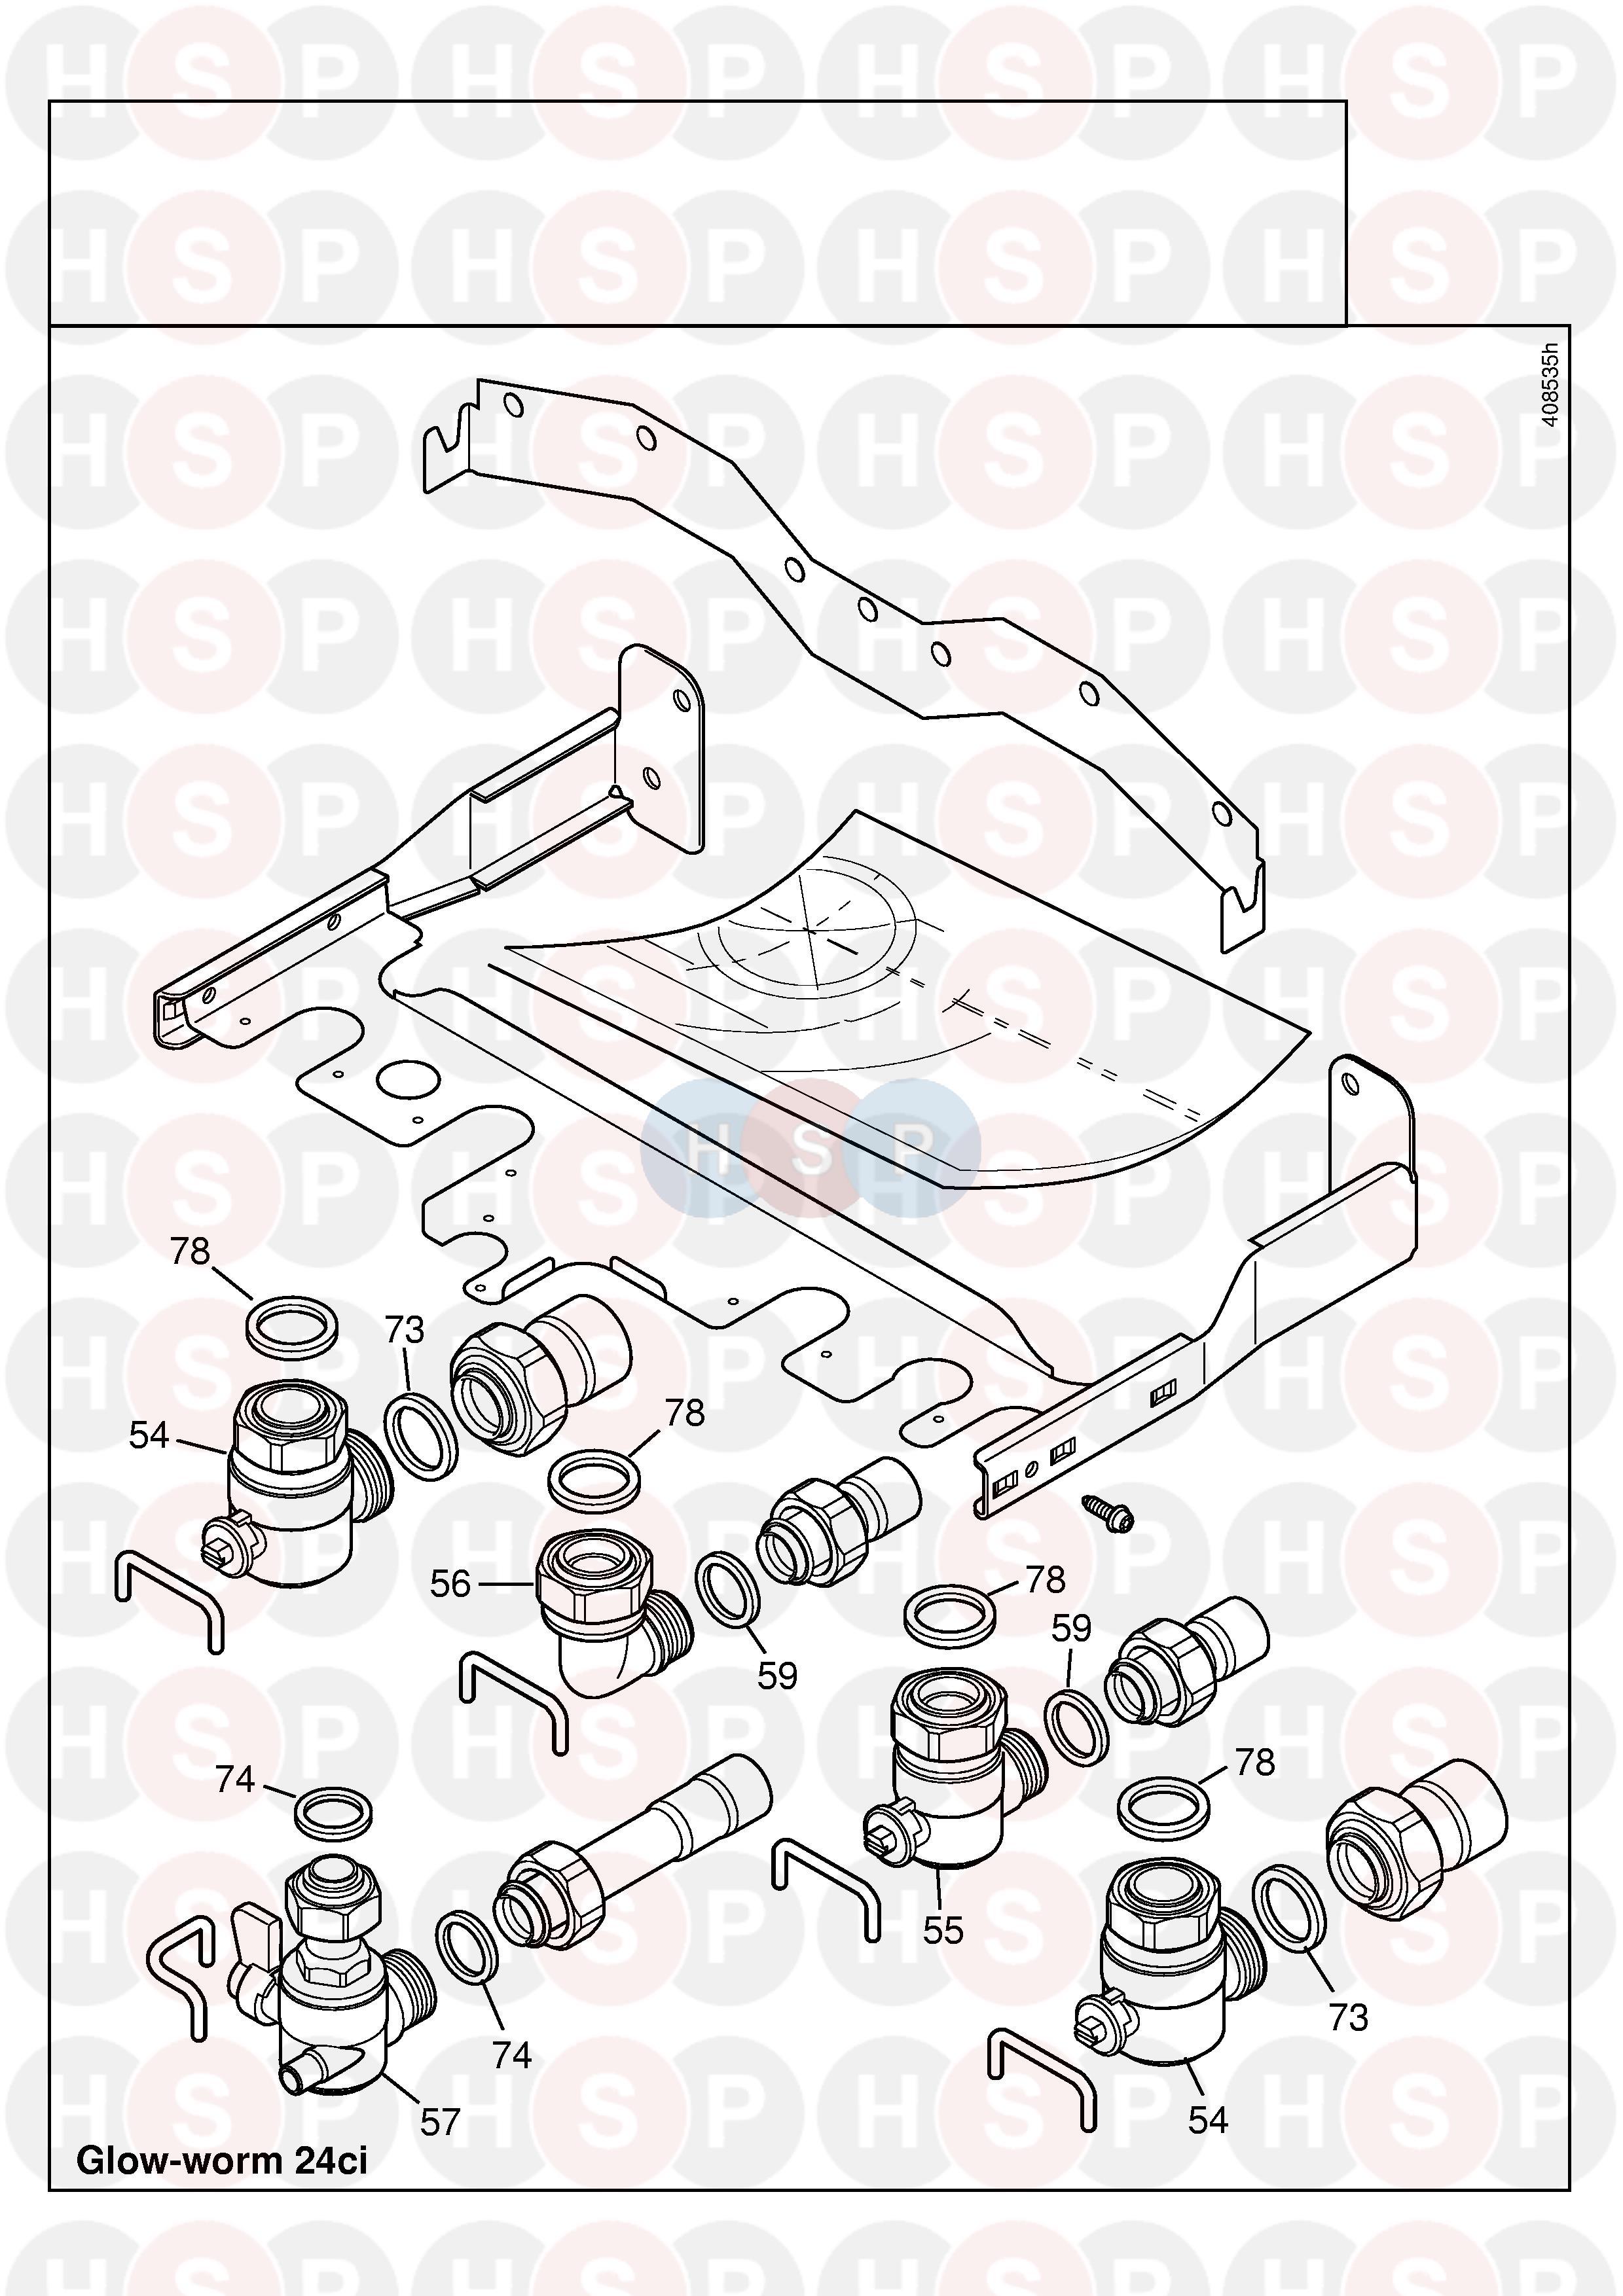 Glowworm GLOWWORM 24CI (PIPE WORK) Diagram | Heating Spare Parts